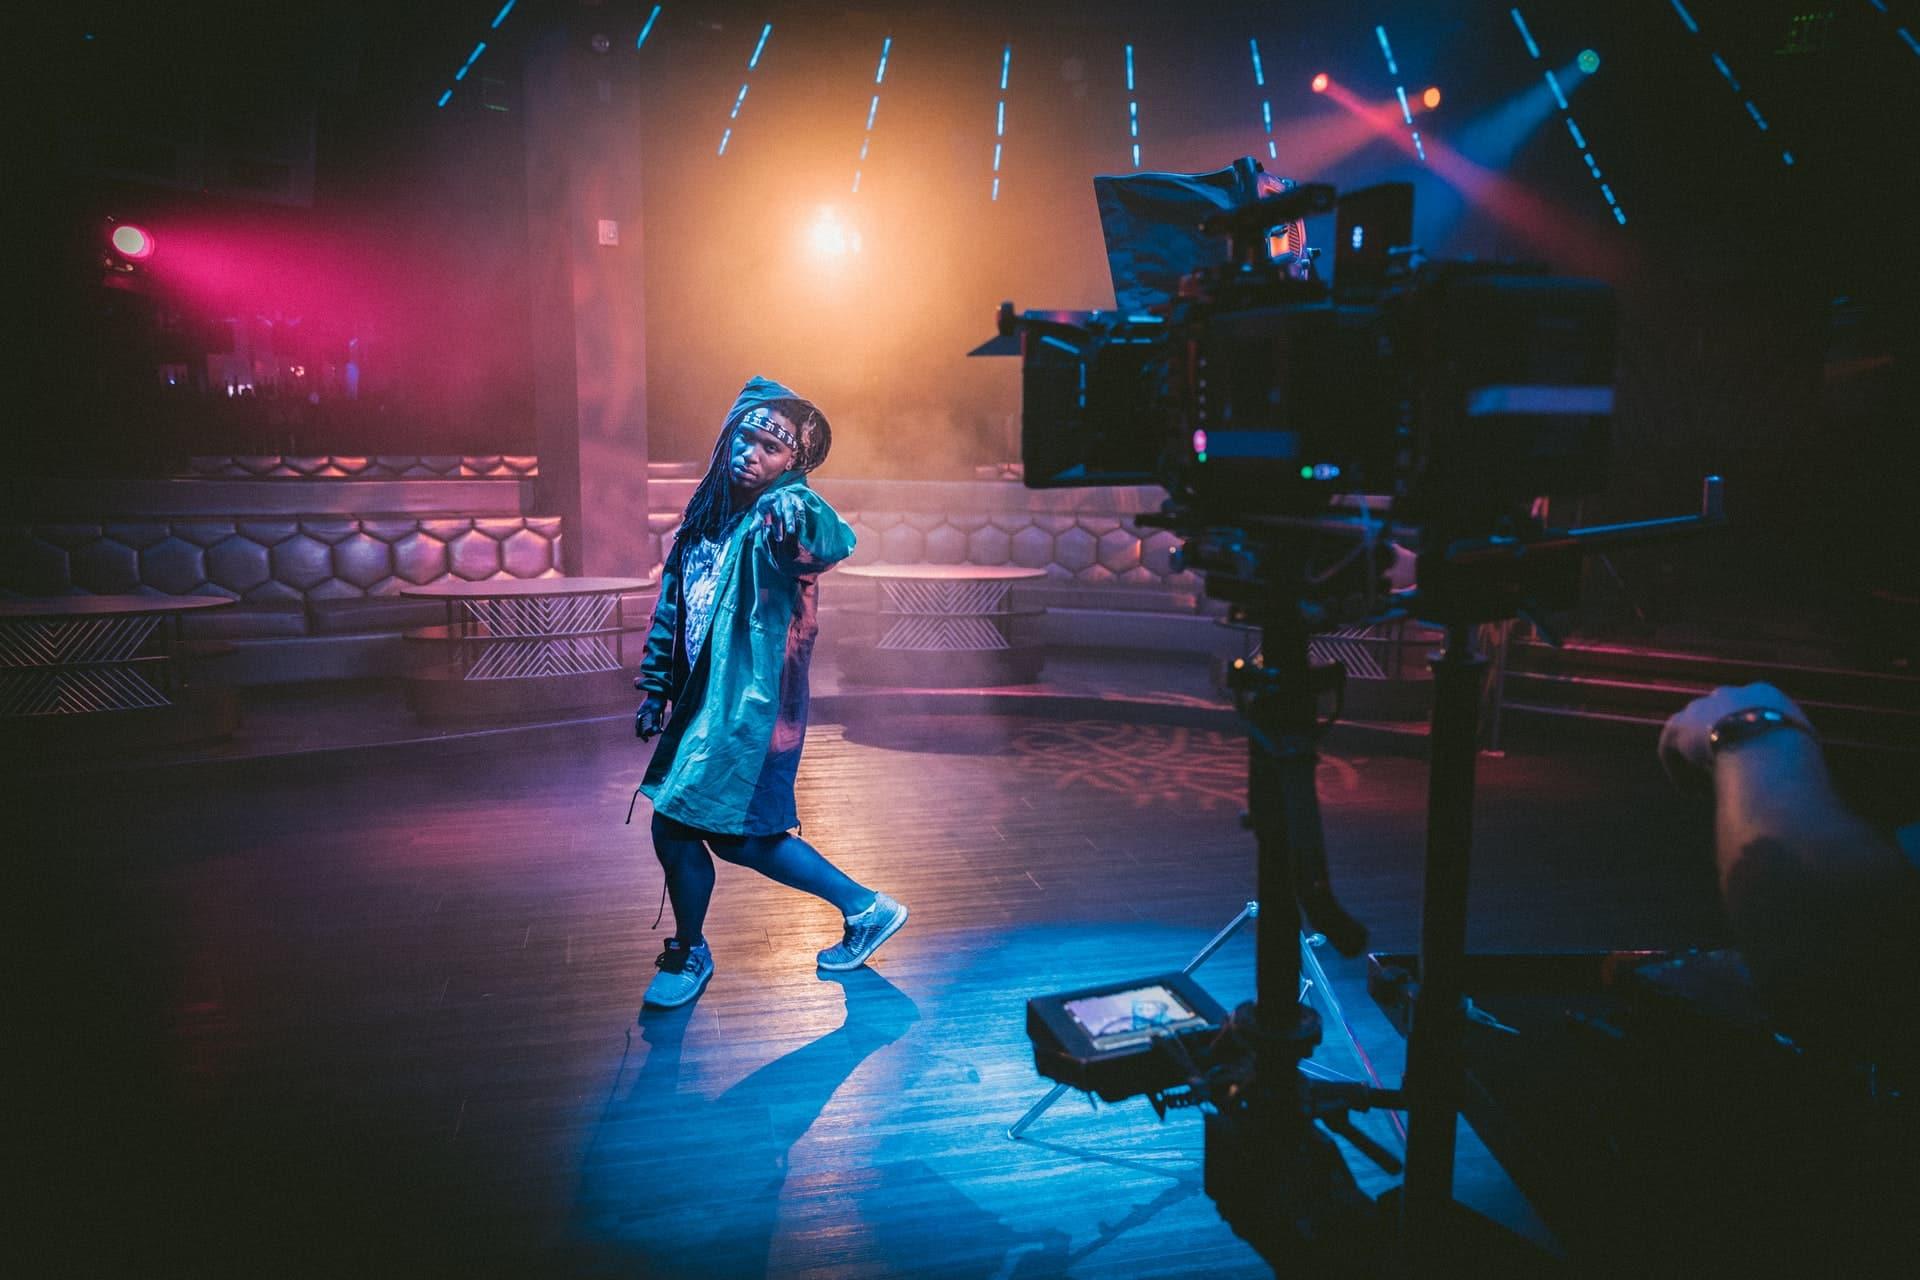 Market Music Video Header Image